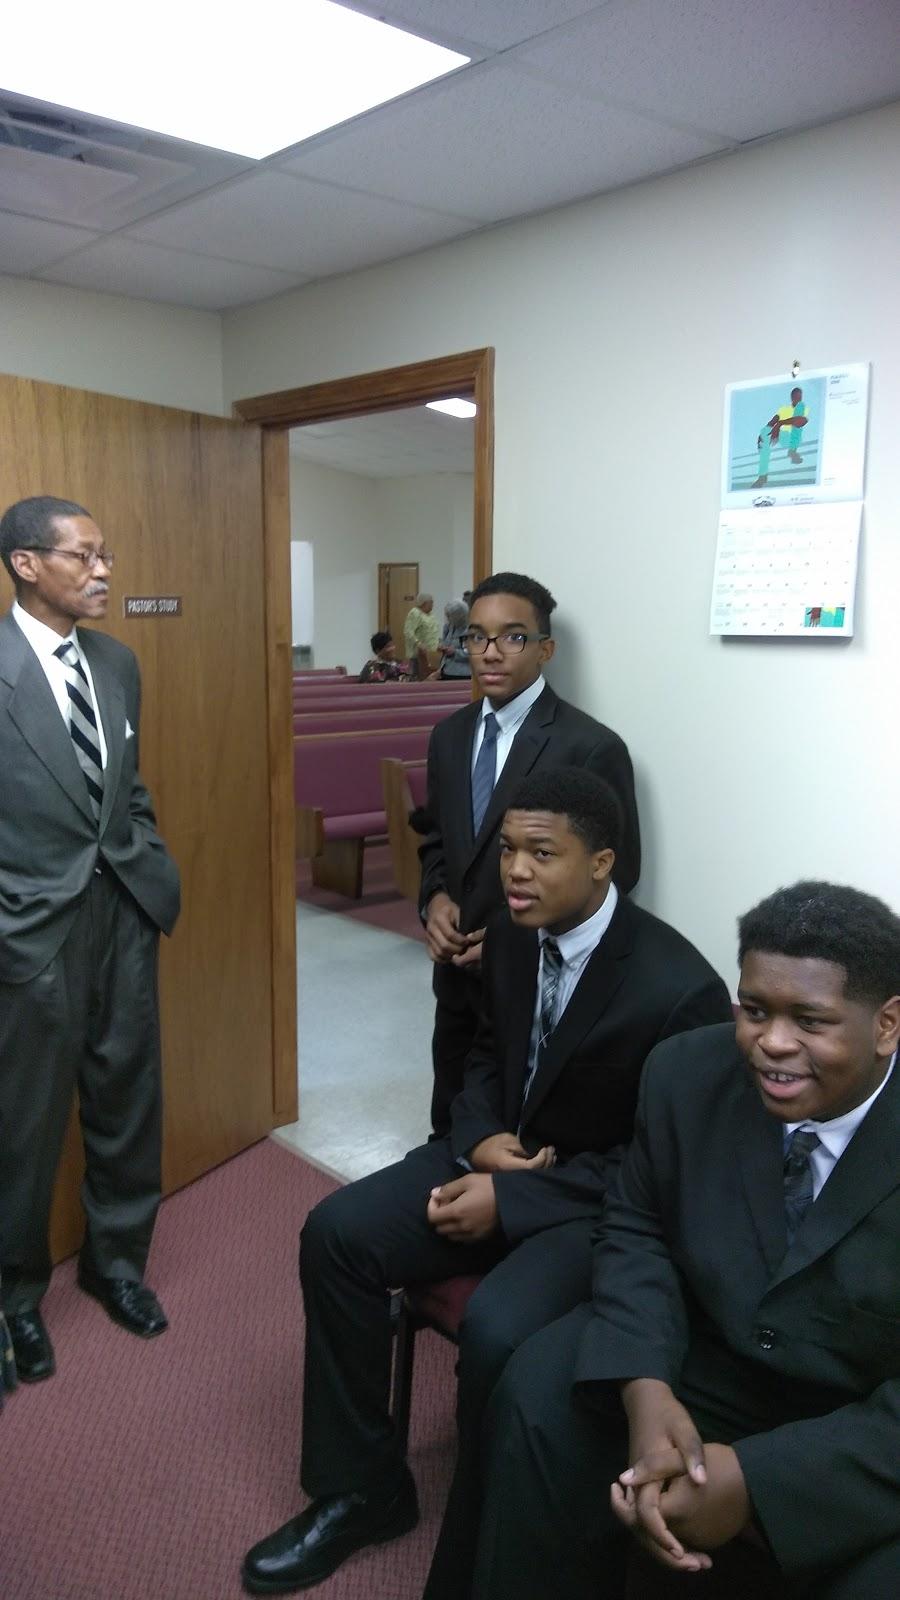 Pilgrim Rest Baptist Church - church    Photo 7 of 10   Address: Tulsa, OK 74106, USA   Phone: (918) 583-0007